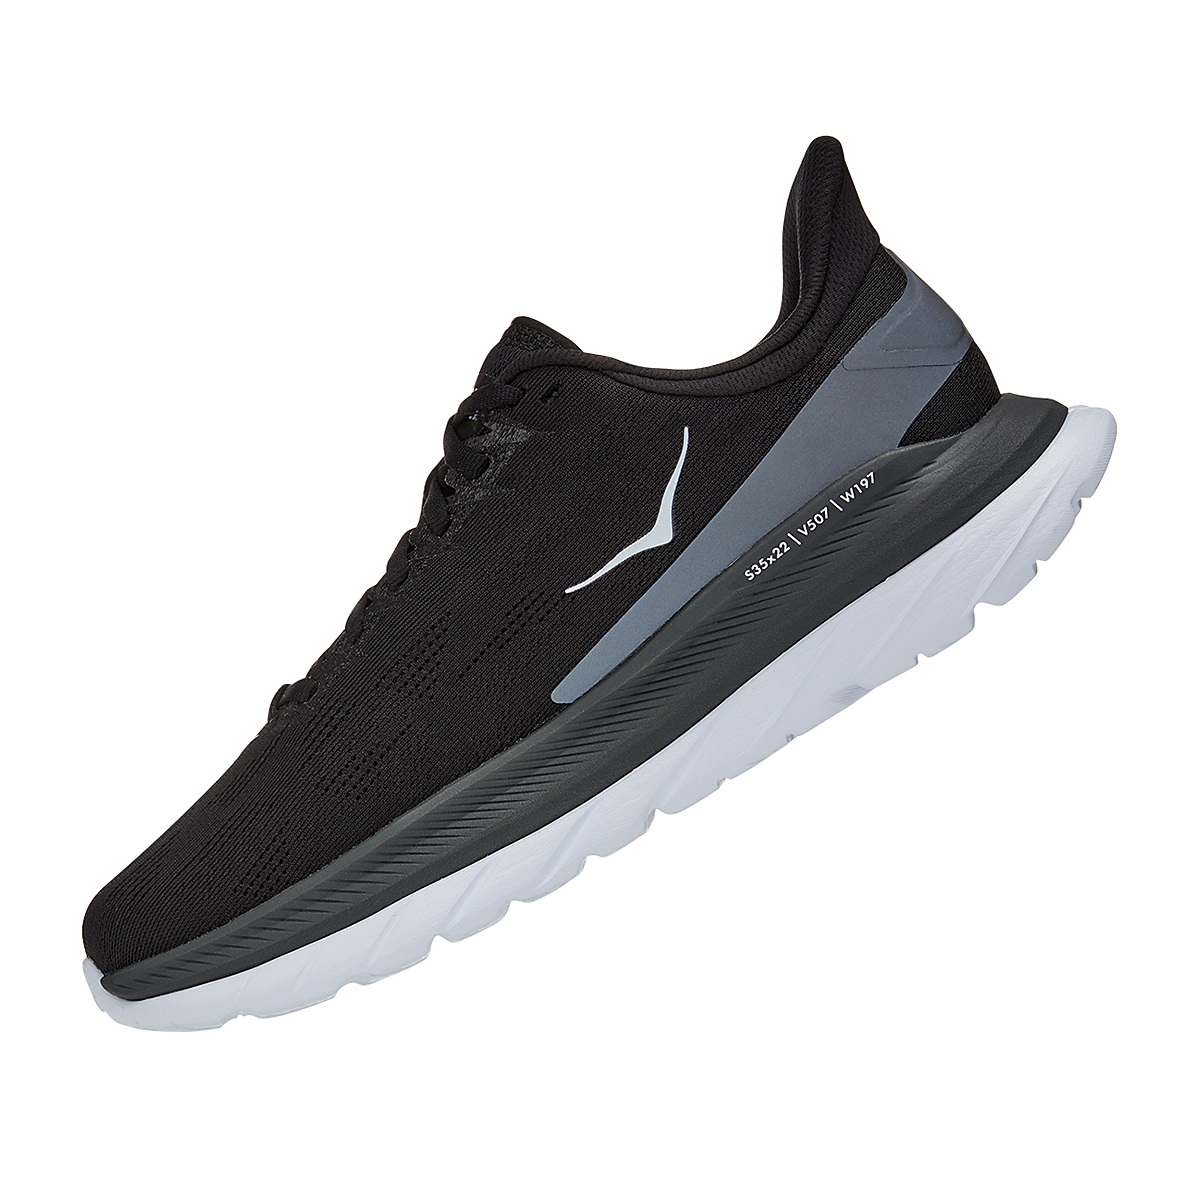 Women's Hoka One One Mach 4 Running Shoe - Color: Black/Dark Shadow - Size: 5 - Width: Regular, Black/Dark Shadow, large, image 2